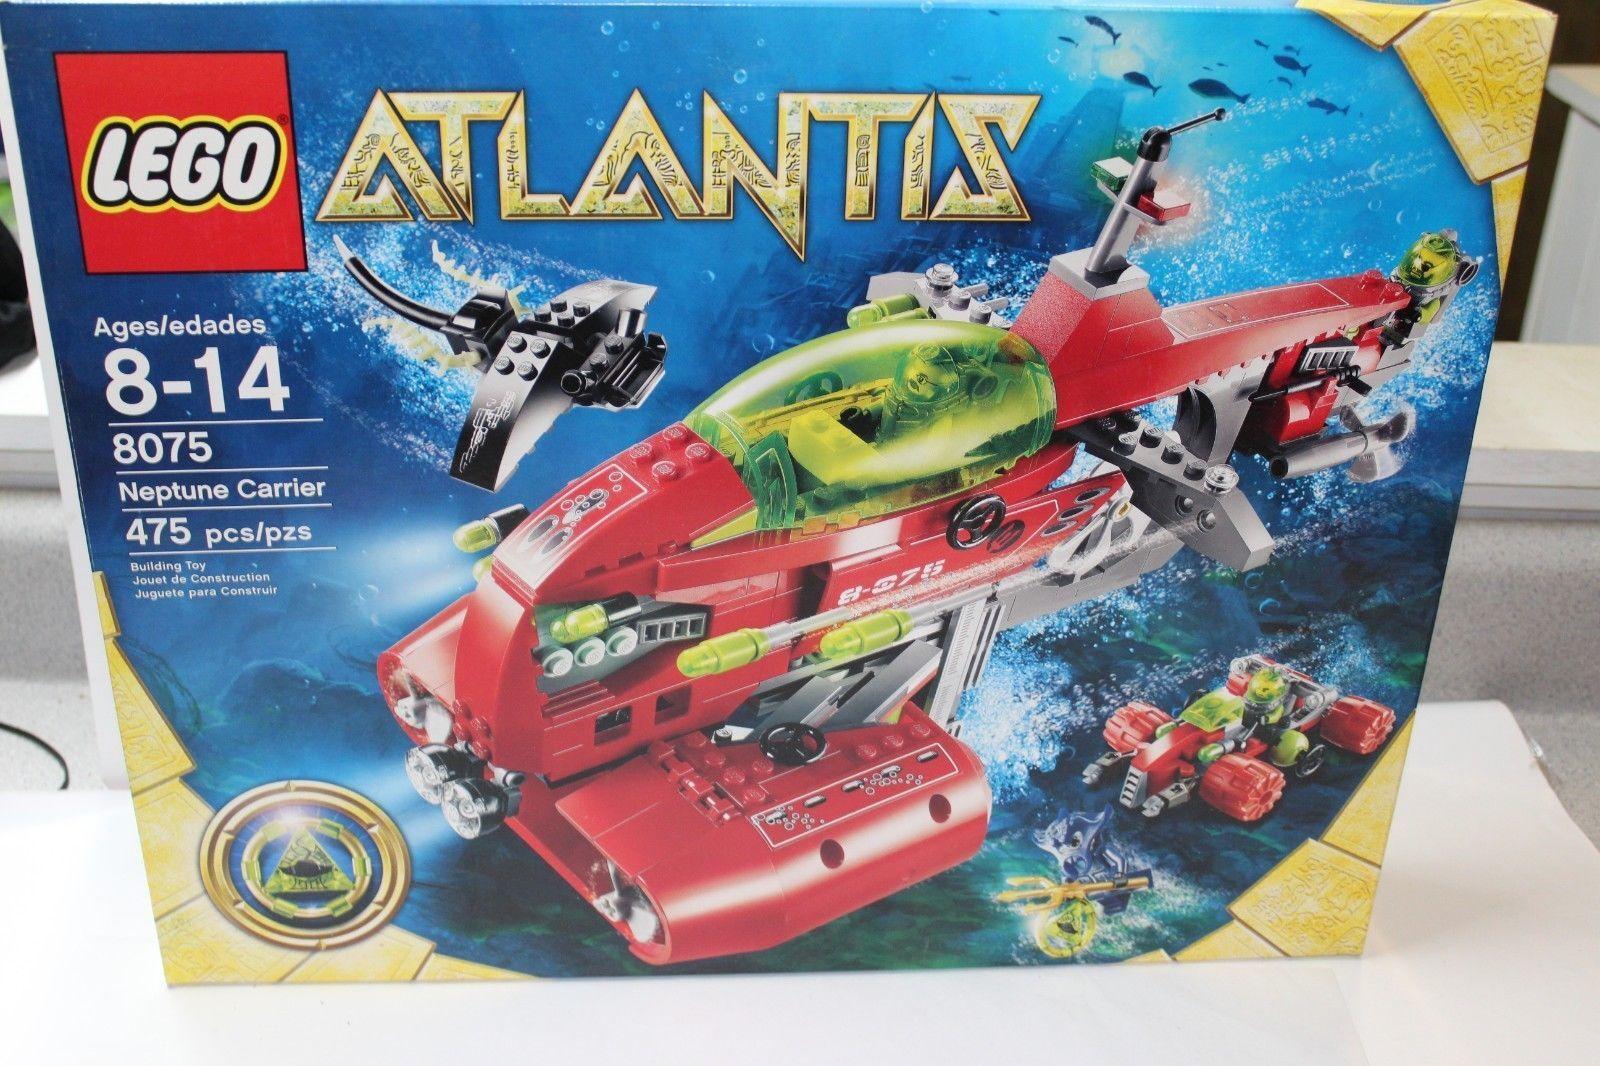 BRAND BRAND BRAND NEW IN BOX LEGO 8075 Atlantis Neptune Carrier  NIB 0cbbe9